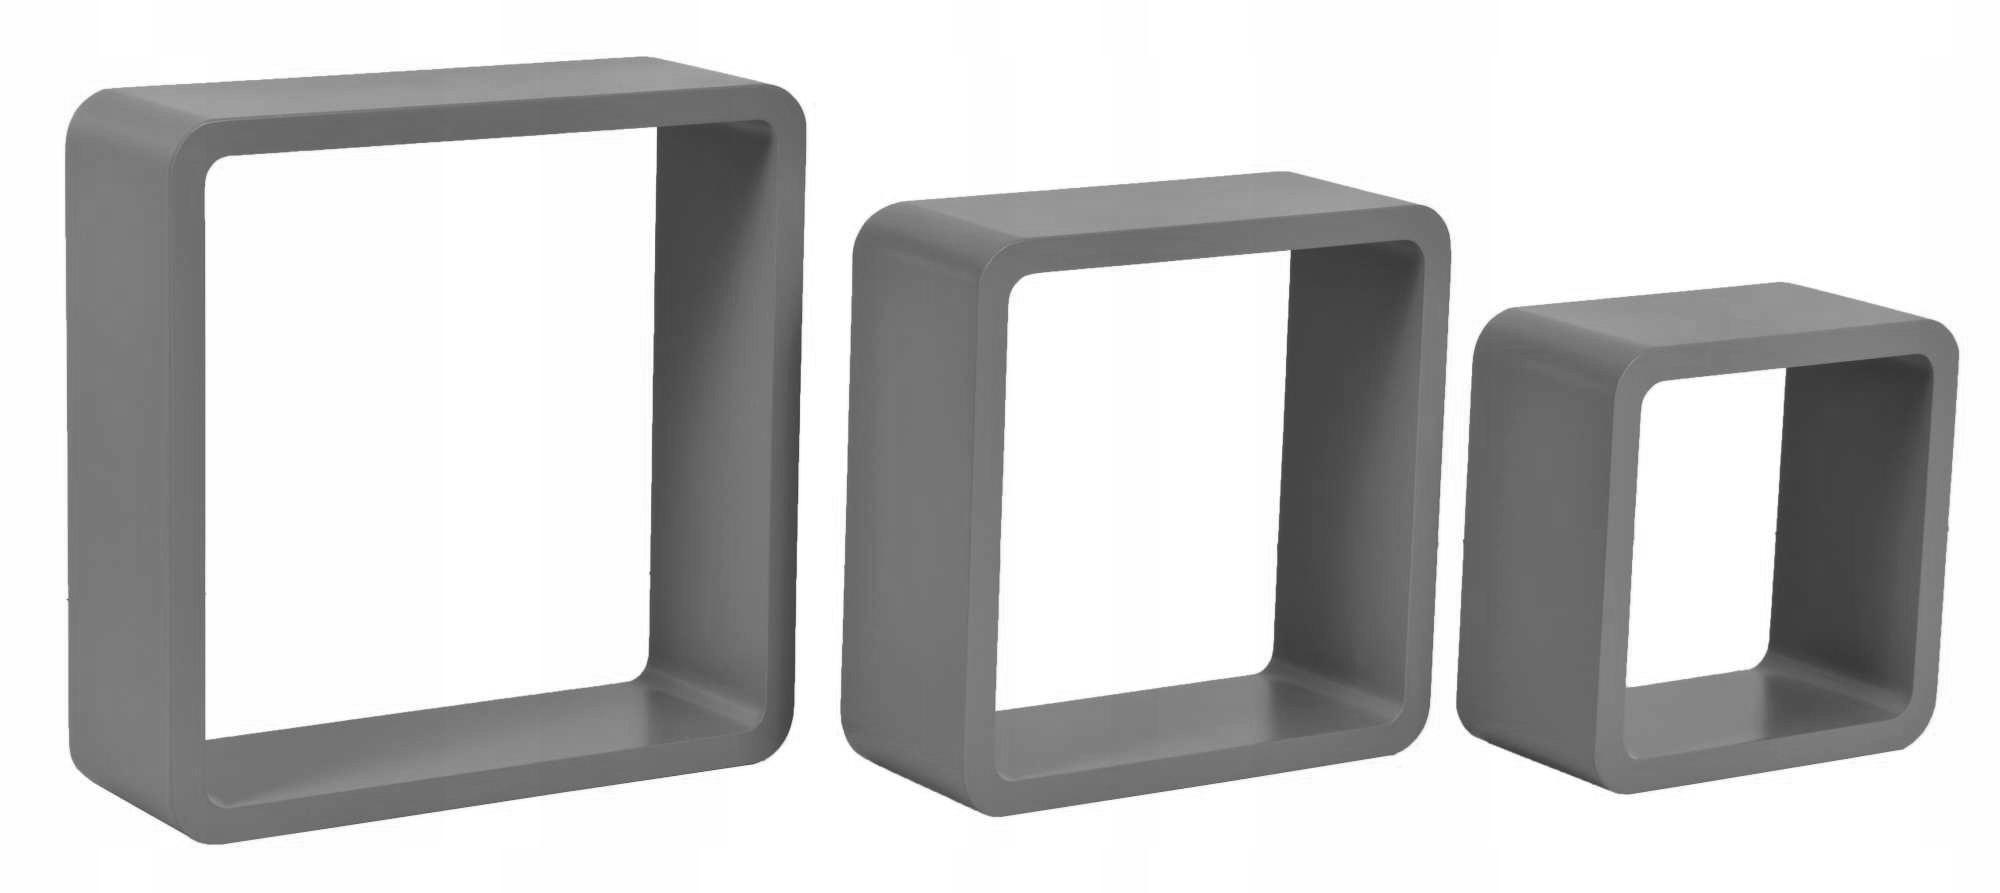 3 Półki Wiszące Cube Quad Szary Ehokerypl Tanie Hokery